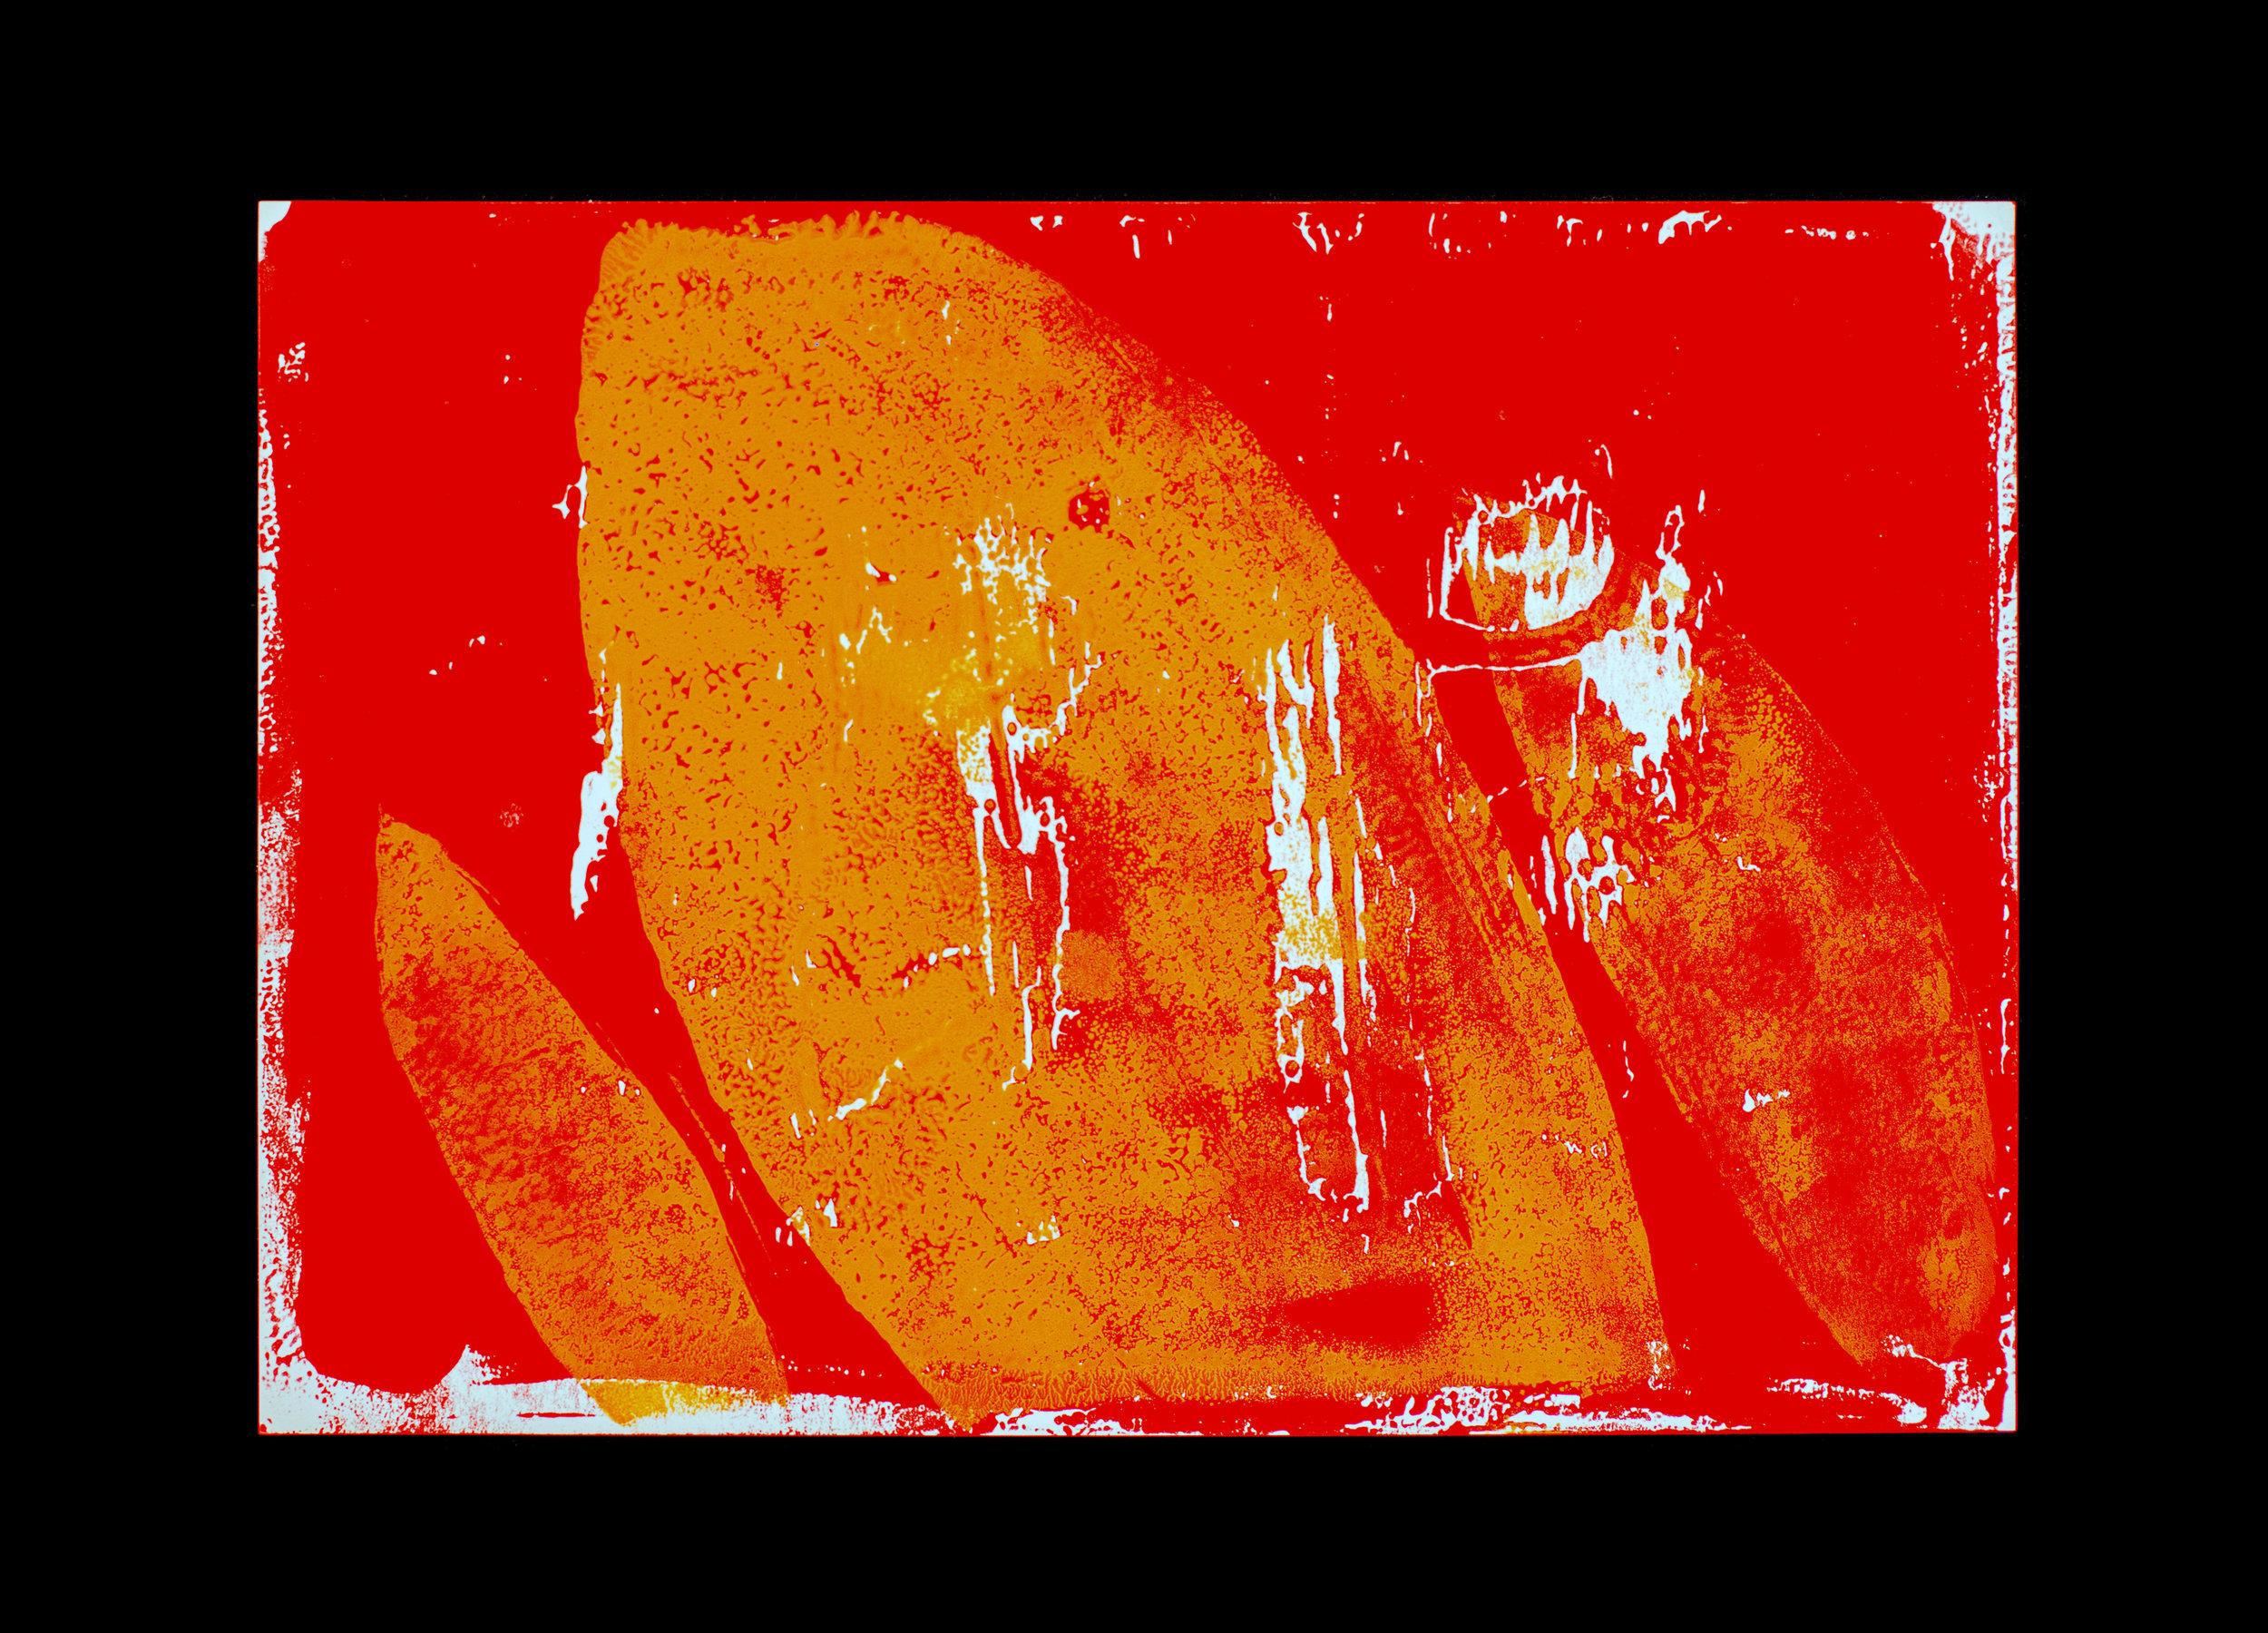 Marion_2 copie.jpg